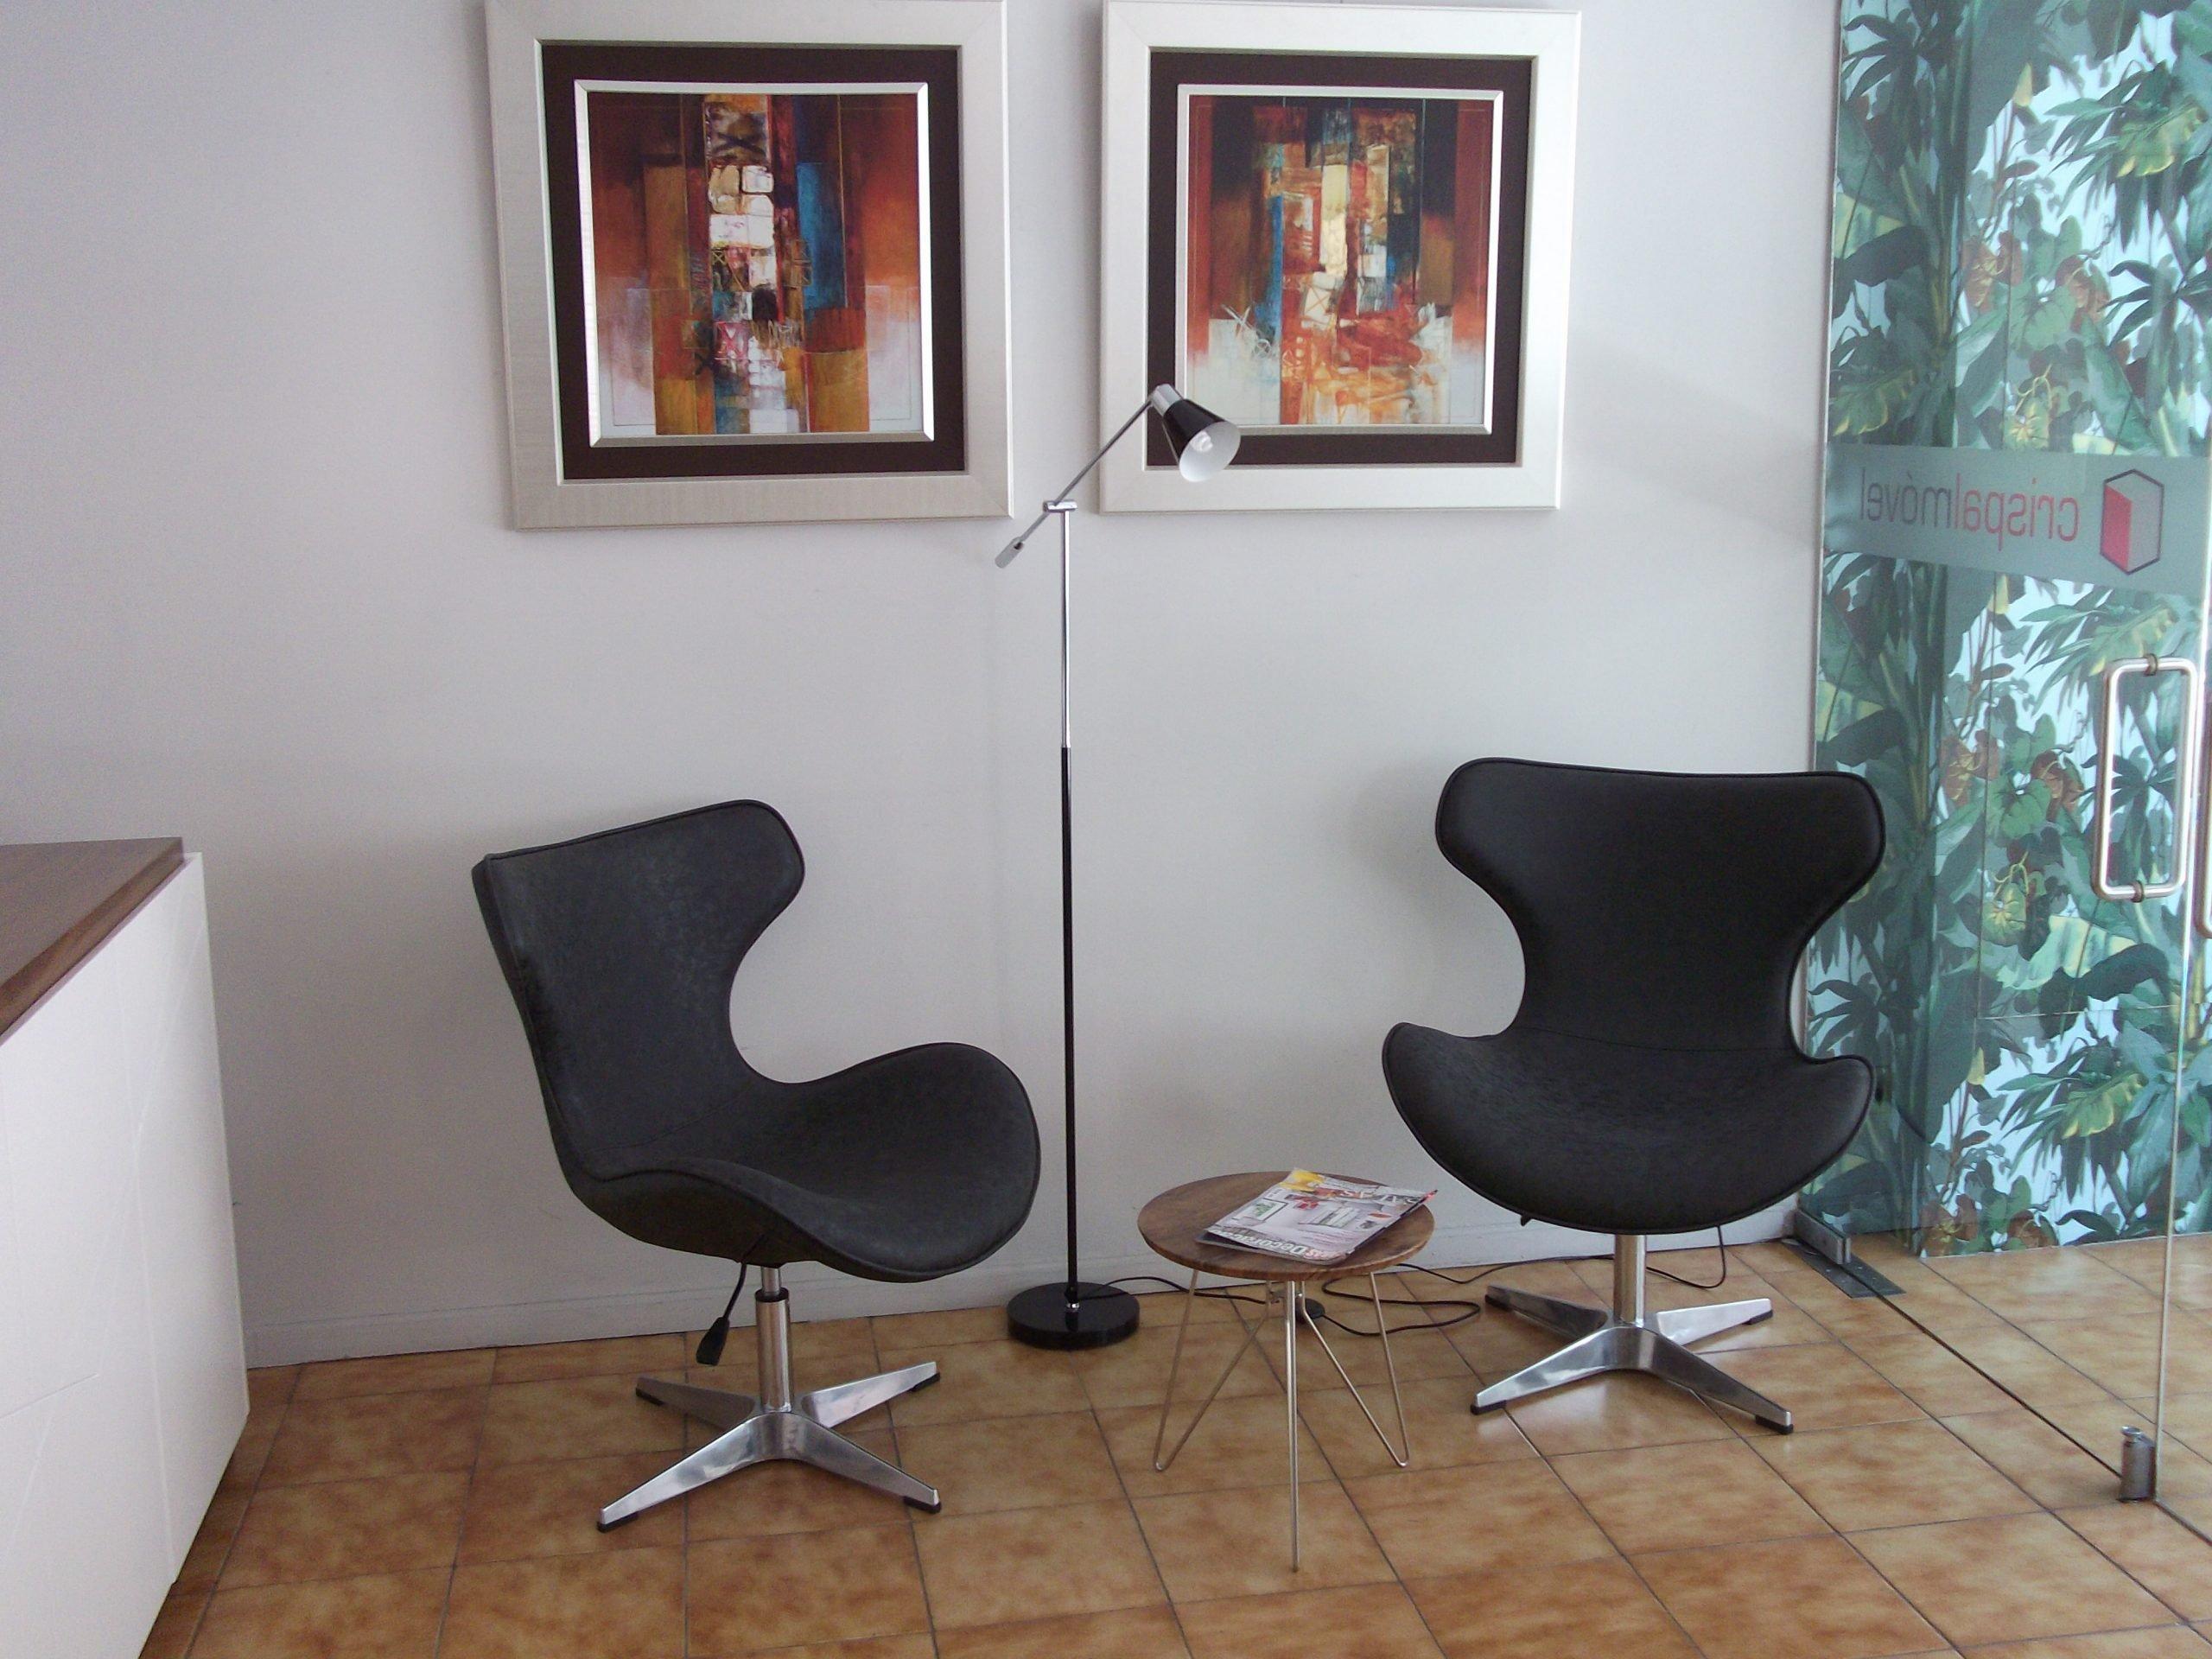 Cadeirao ADoze ref Cadeirao003